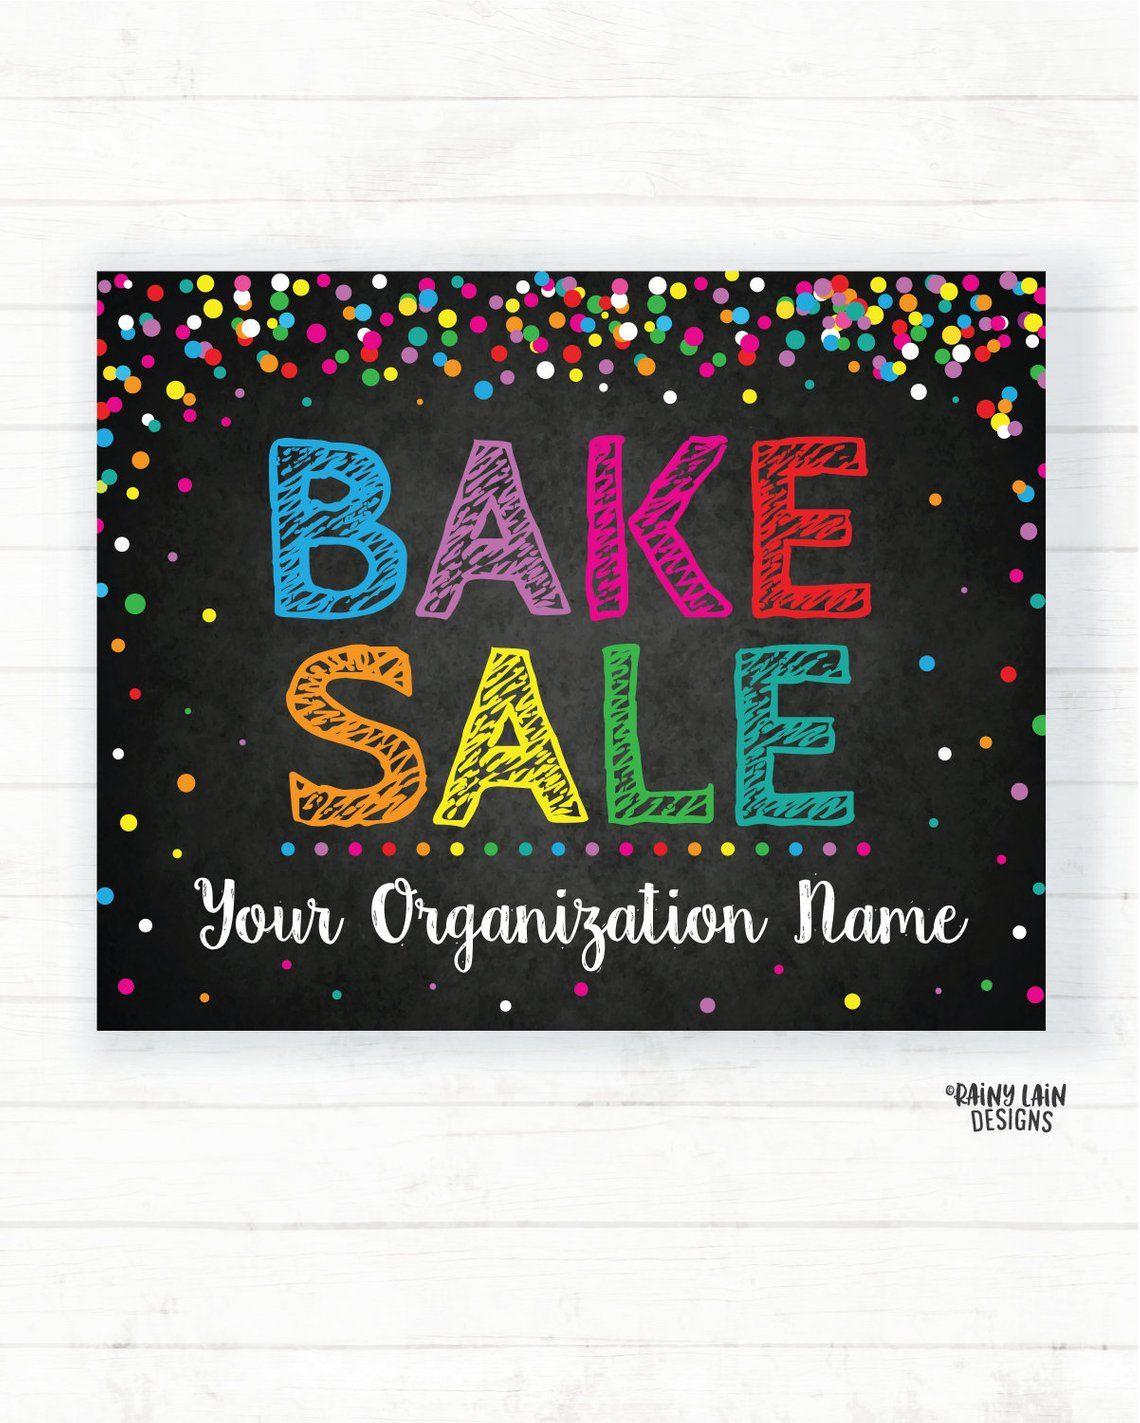 Bake Sale Sign, Custom Bake Sale Poster, Fundraising Booth Sign, Fundraising Poster, Digital, Custom Banner, Chalkboard, Rainbow Confetti #bakesaleideas